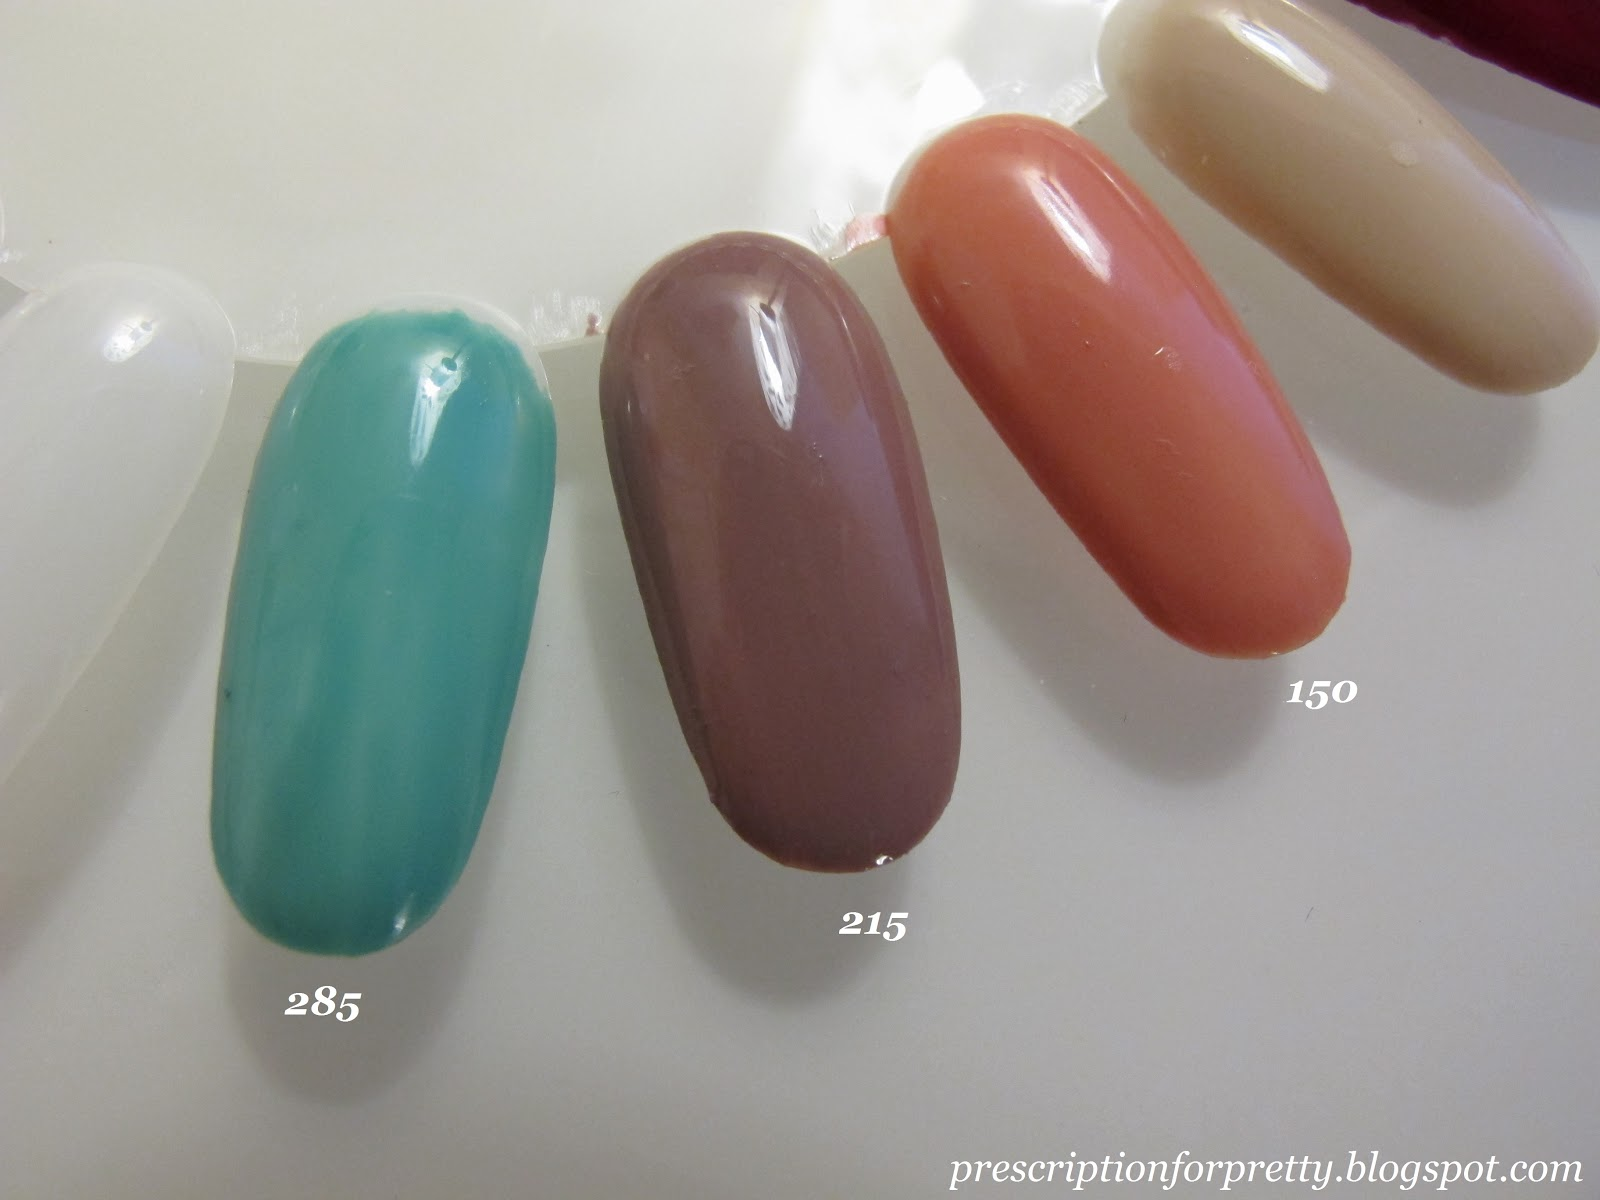 Prescription For Pretty Covergirl Outlast Stay Brilliant Nail Gloss New Nail Polish Swatches